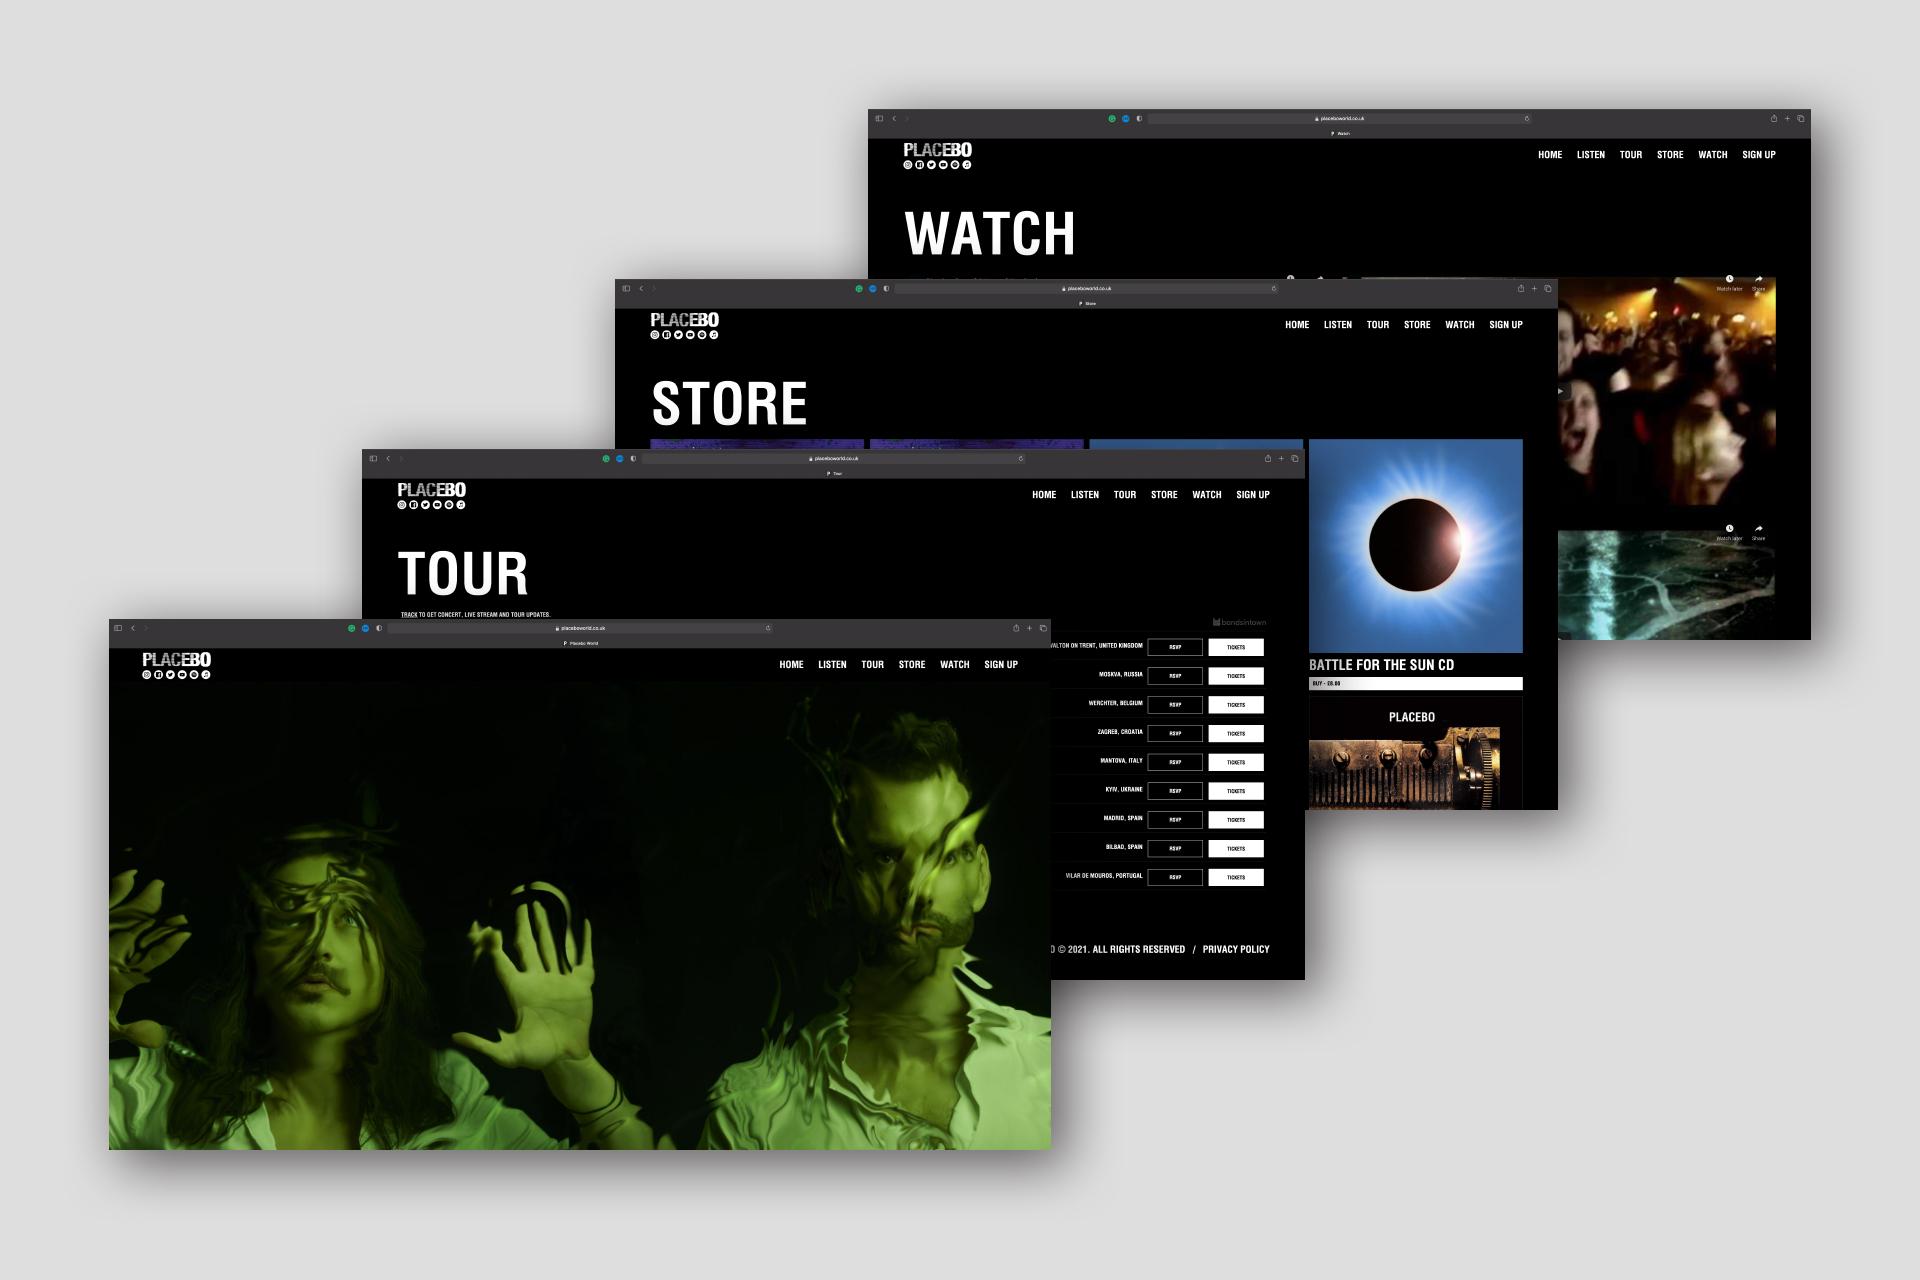 placebo, flower up, placebo band, website, web design, graphic design